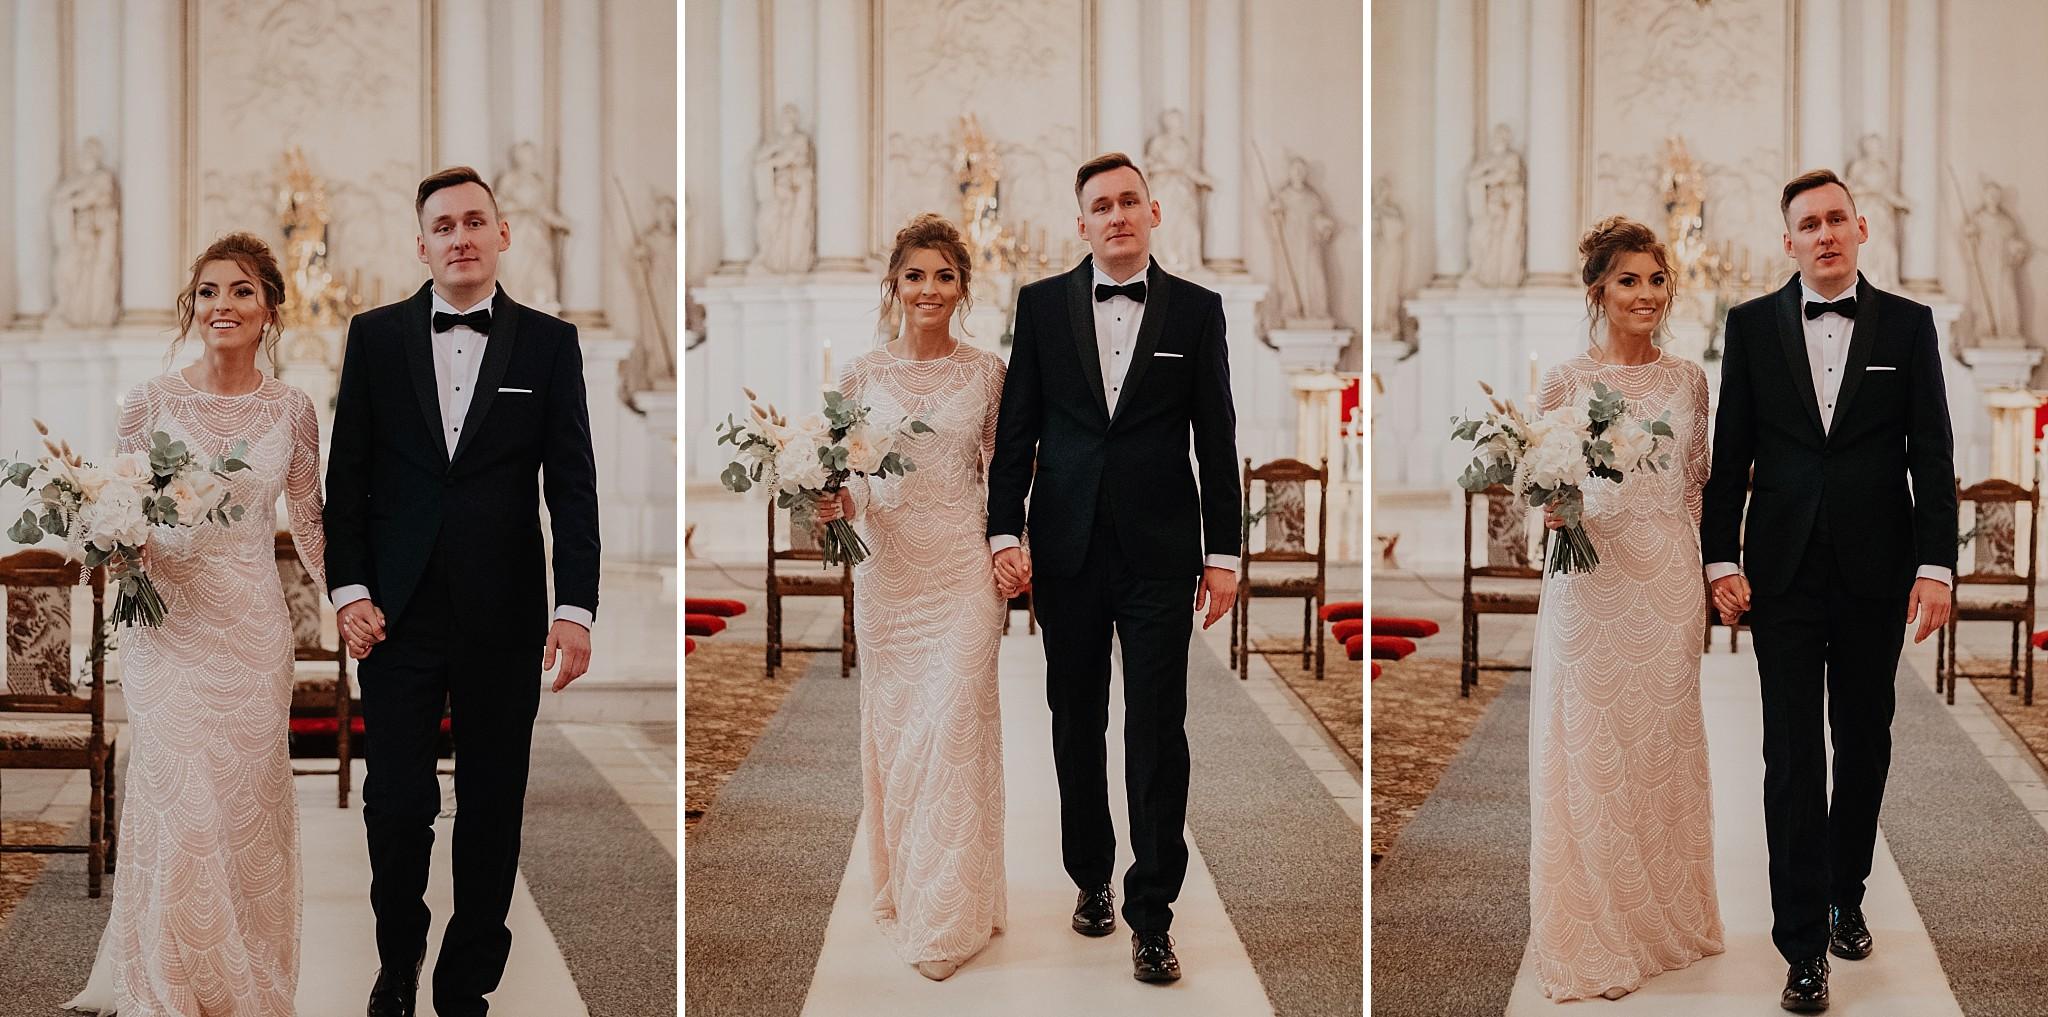 fotograf poznan wesele dobra truskawka piekne wesele pod poznaniem wesele w dobrej truskawce piekna para mloda slub marzen slub koronawirus slub listopad wesele koronawirus 210